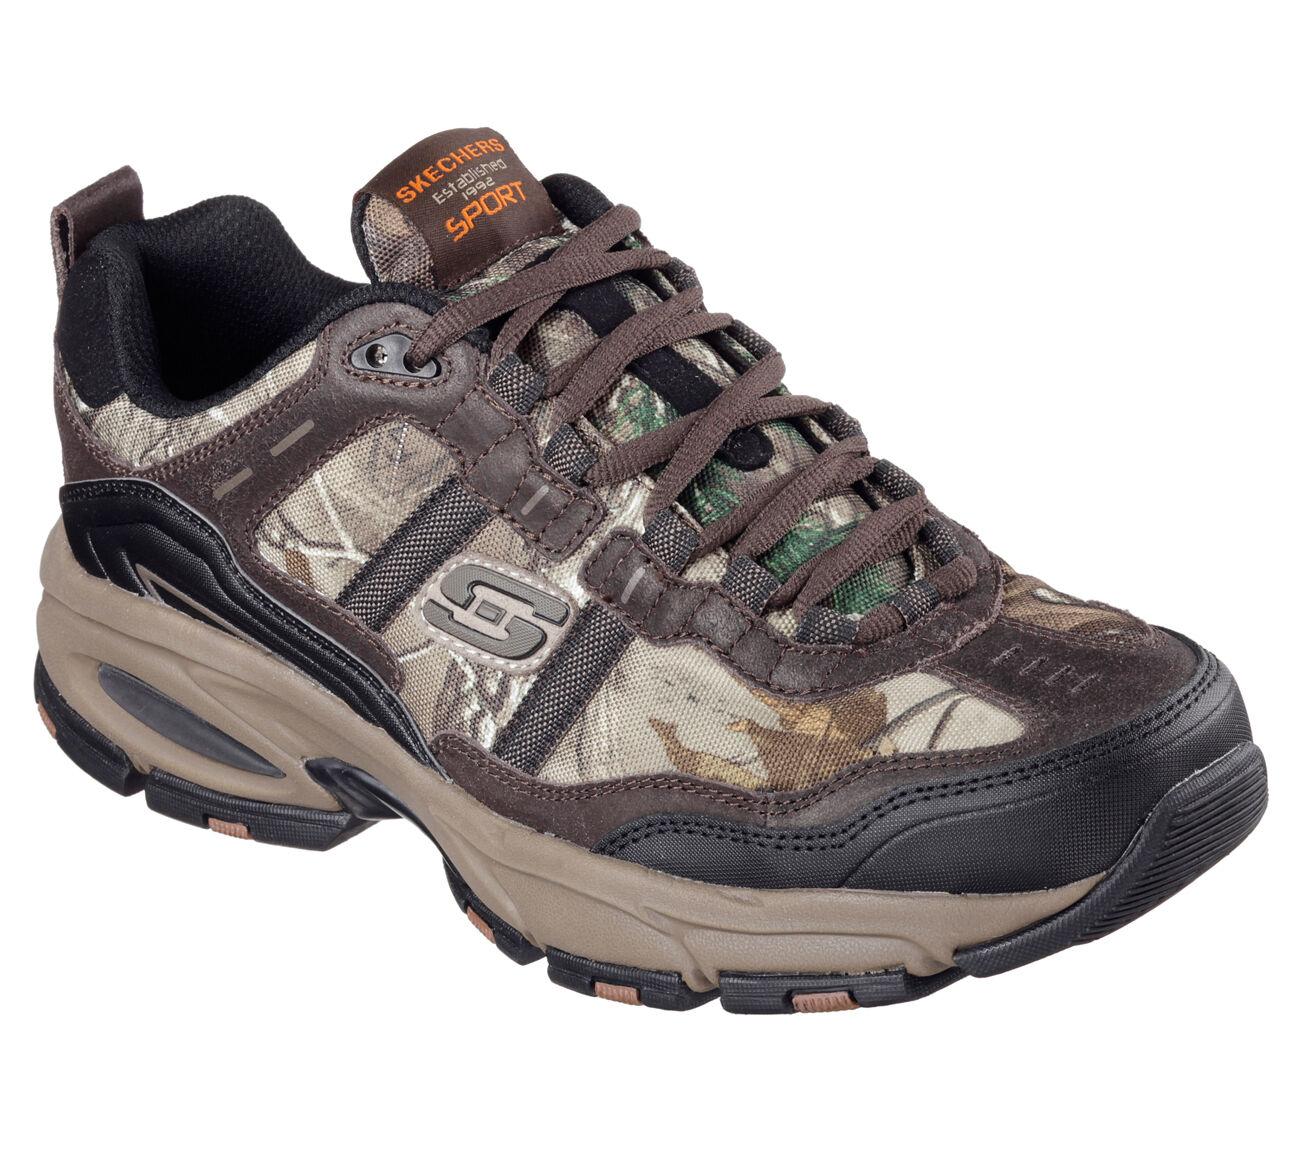 Skechers Wide Fit Camouflage shoes Men's Memory Foam Sport Comfort Casual 51268